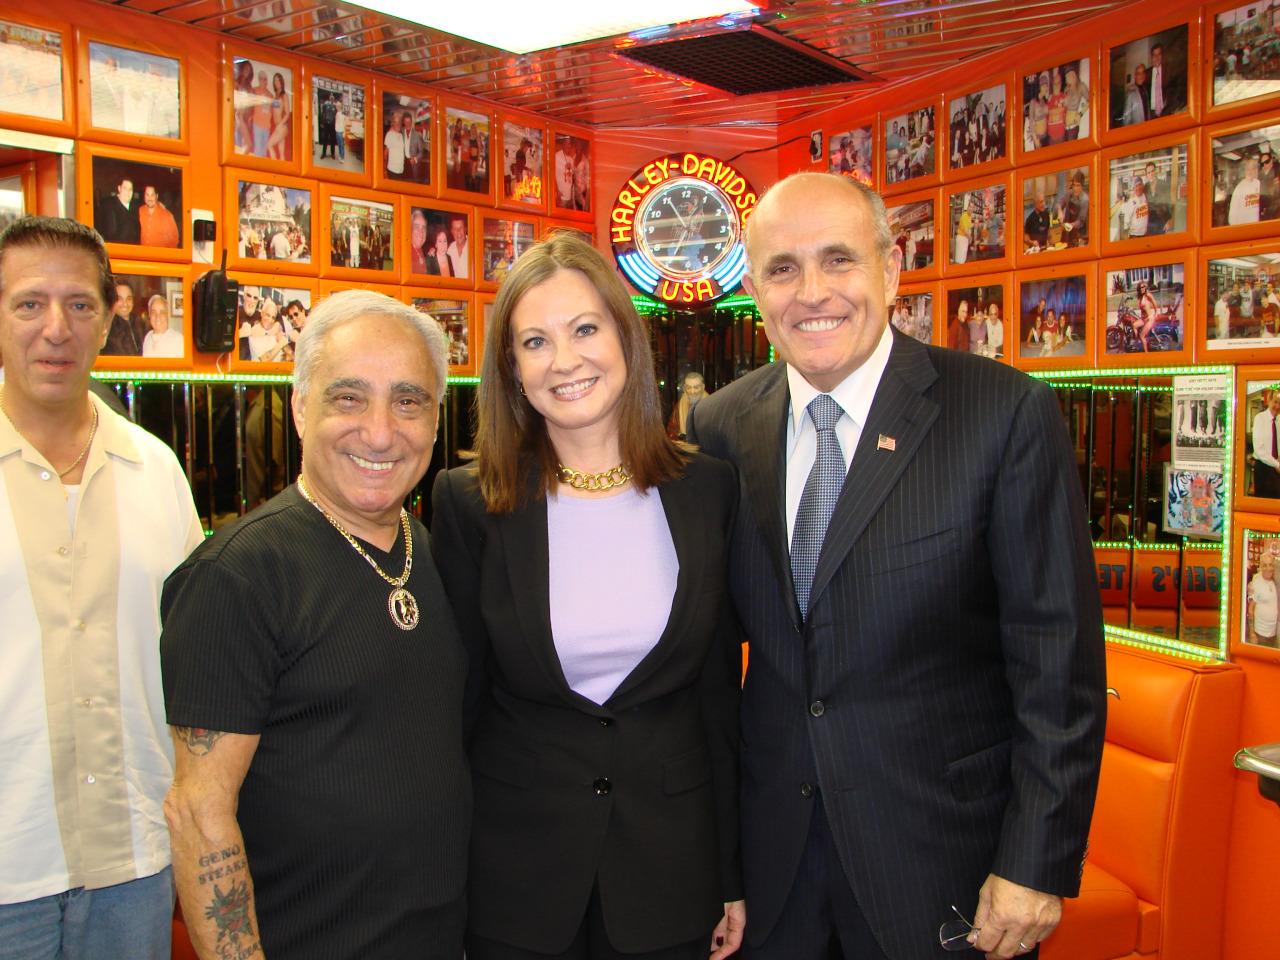 Mayor Rudy Giuliani at Geno's Steaks